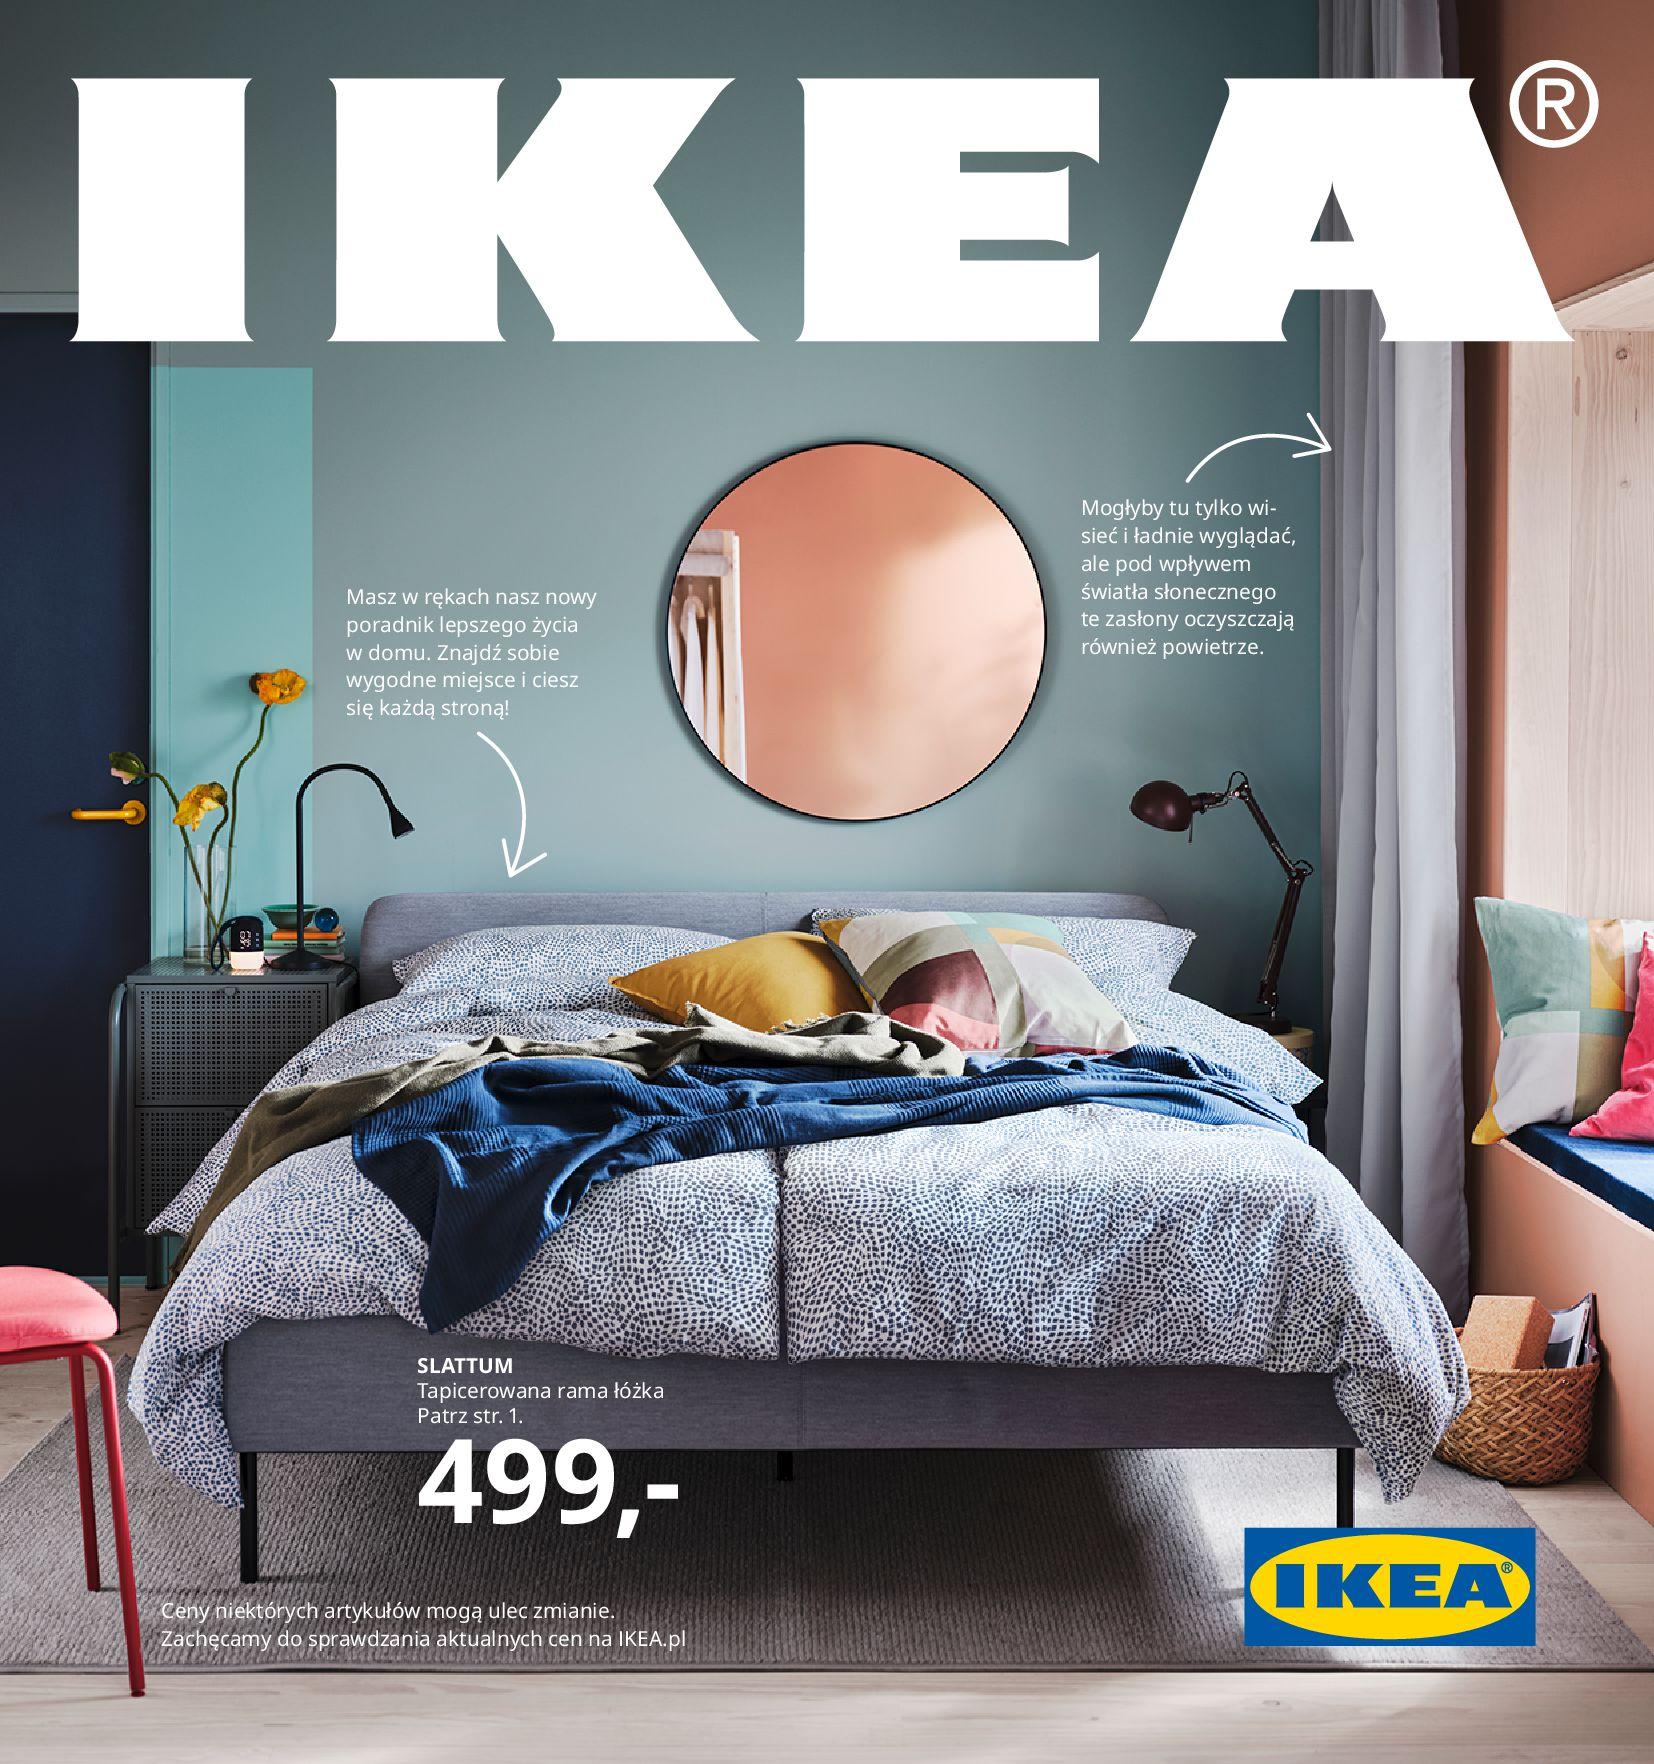 IKEA:   Katalog IKEA 2021 11.08.2020